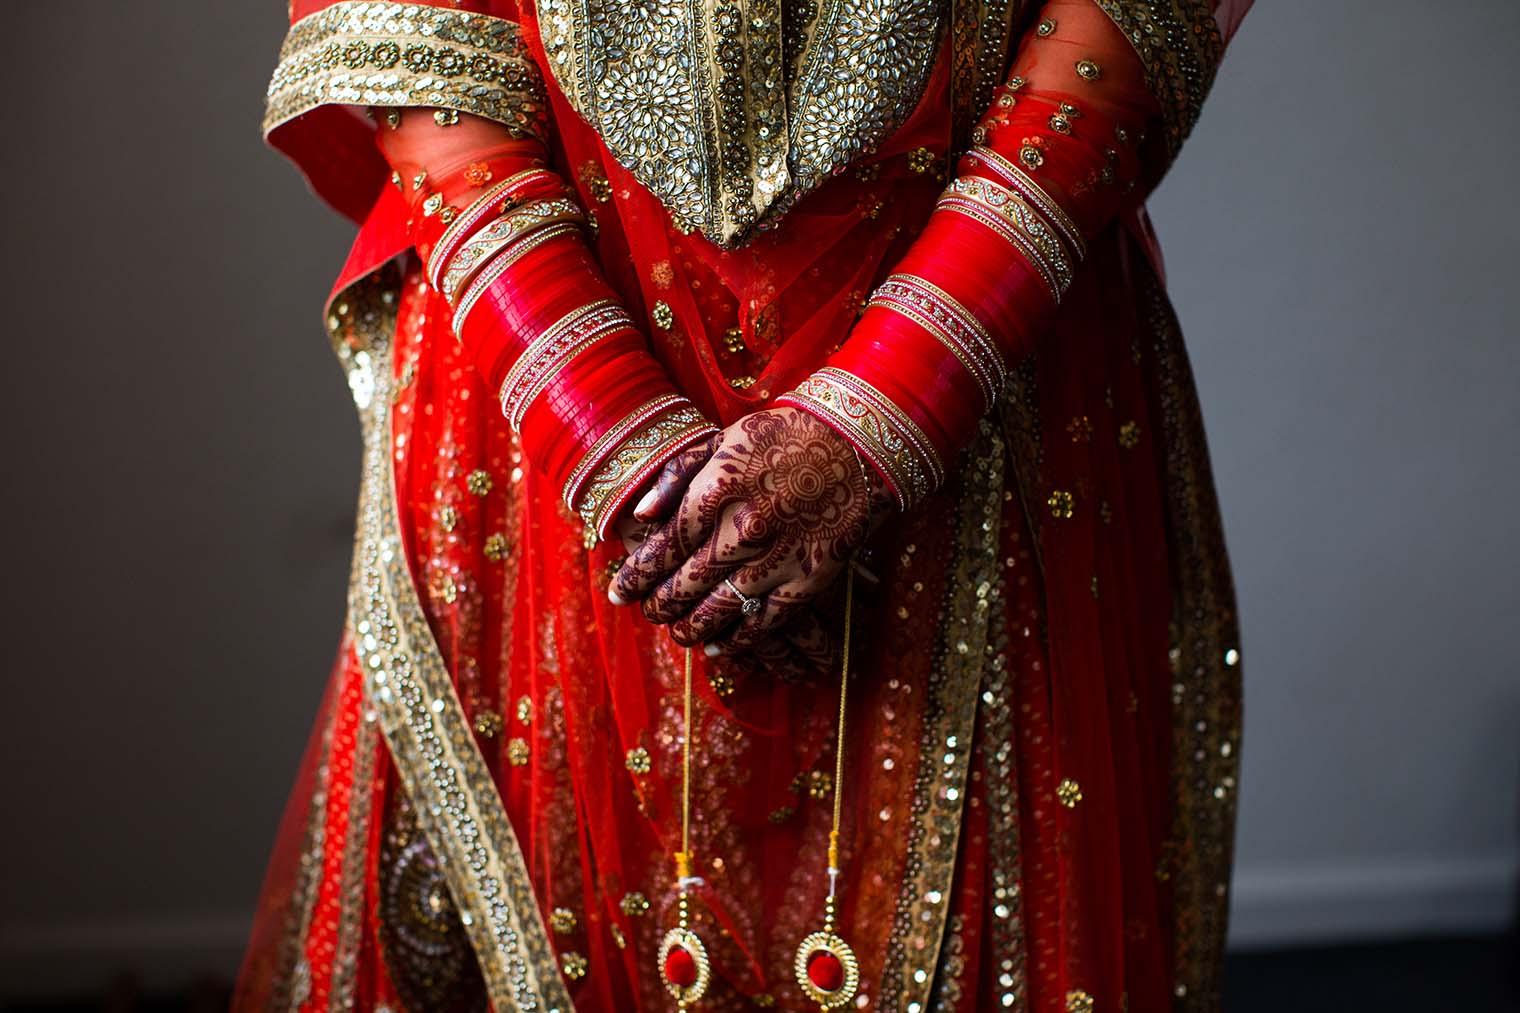 Indian Bride Details at Gurdwara Sahib of Fremont